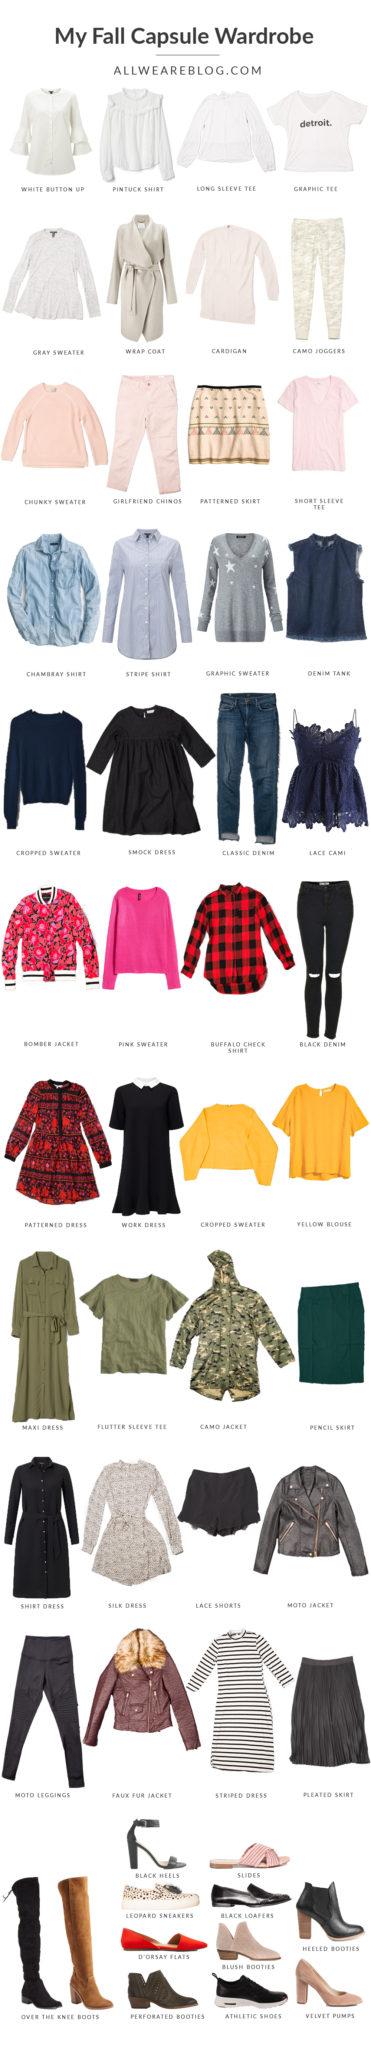 my colorful fall capsule wardrobe on allweareblog.com